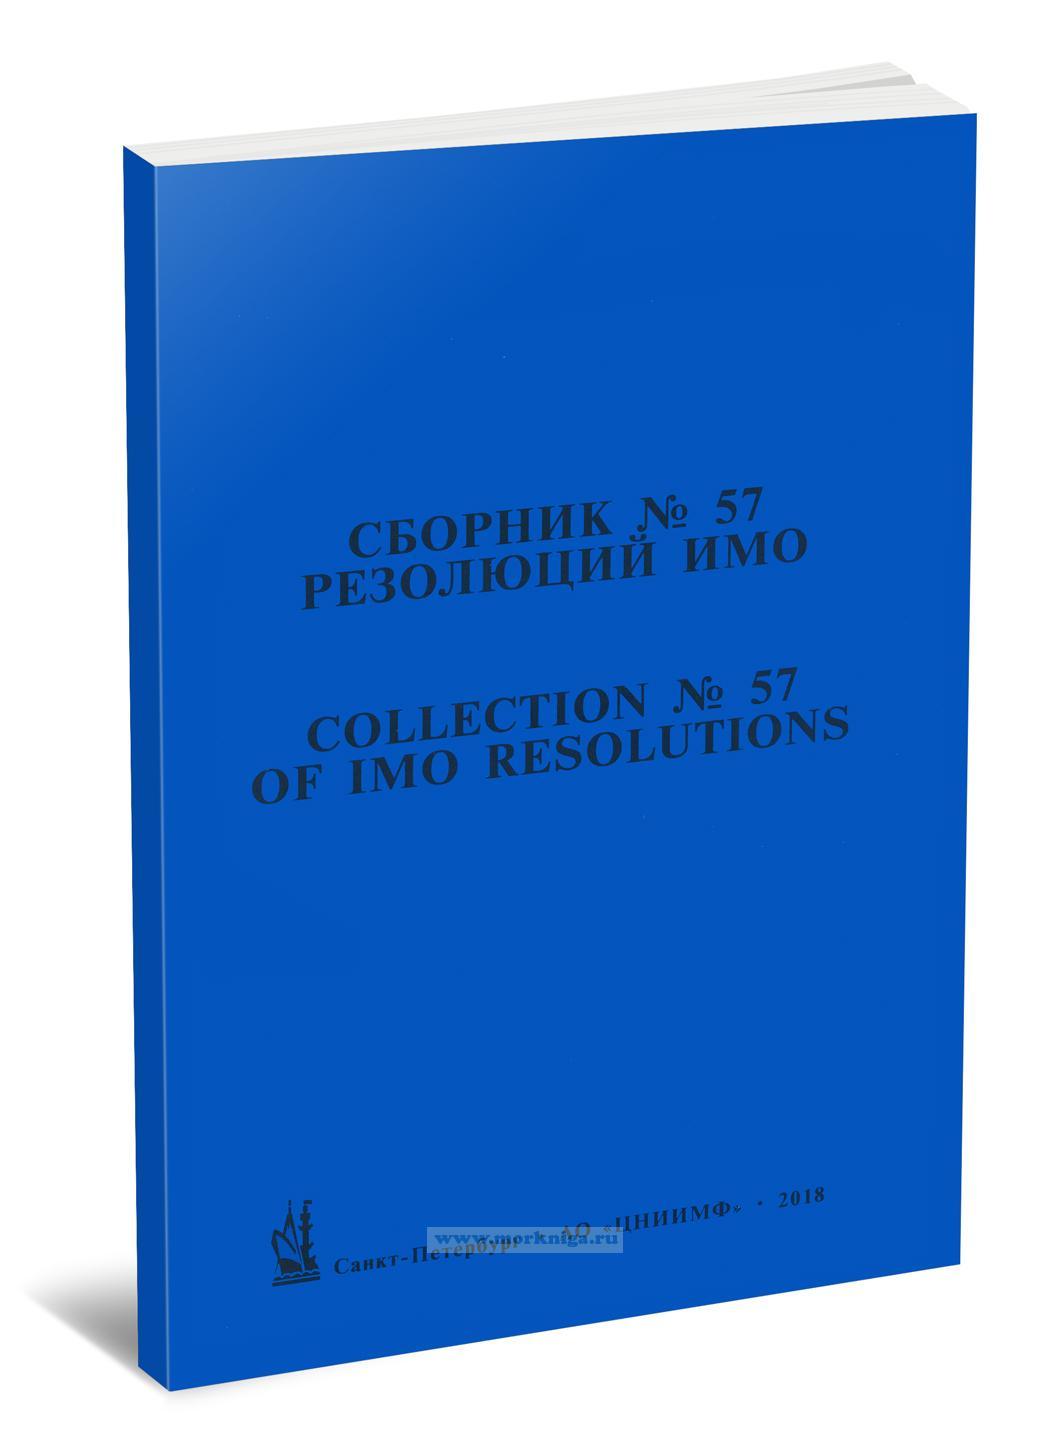 Сборник № 57 резолюций ИМО/ Collection No.57 of IMO Resolutions